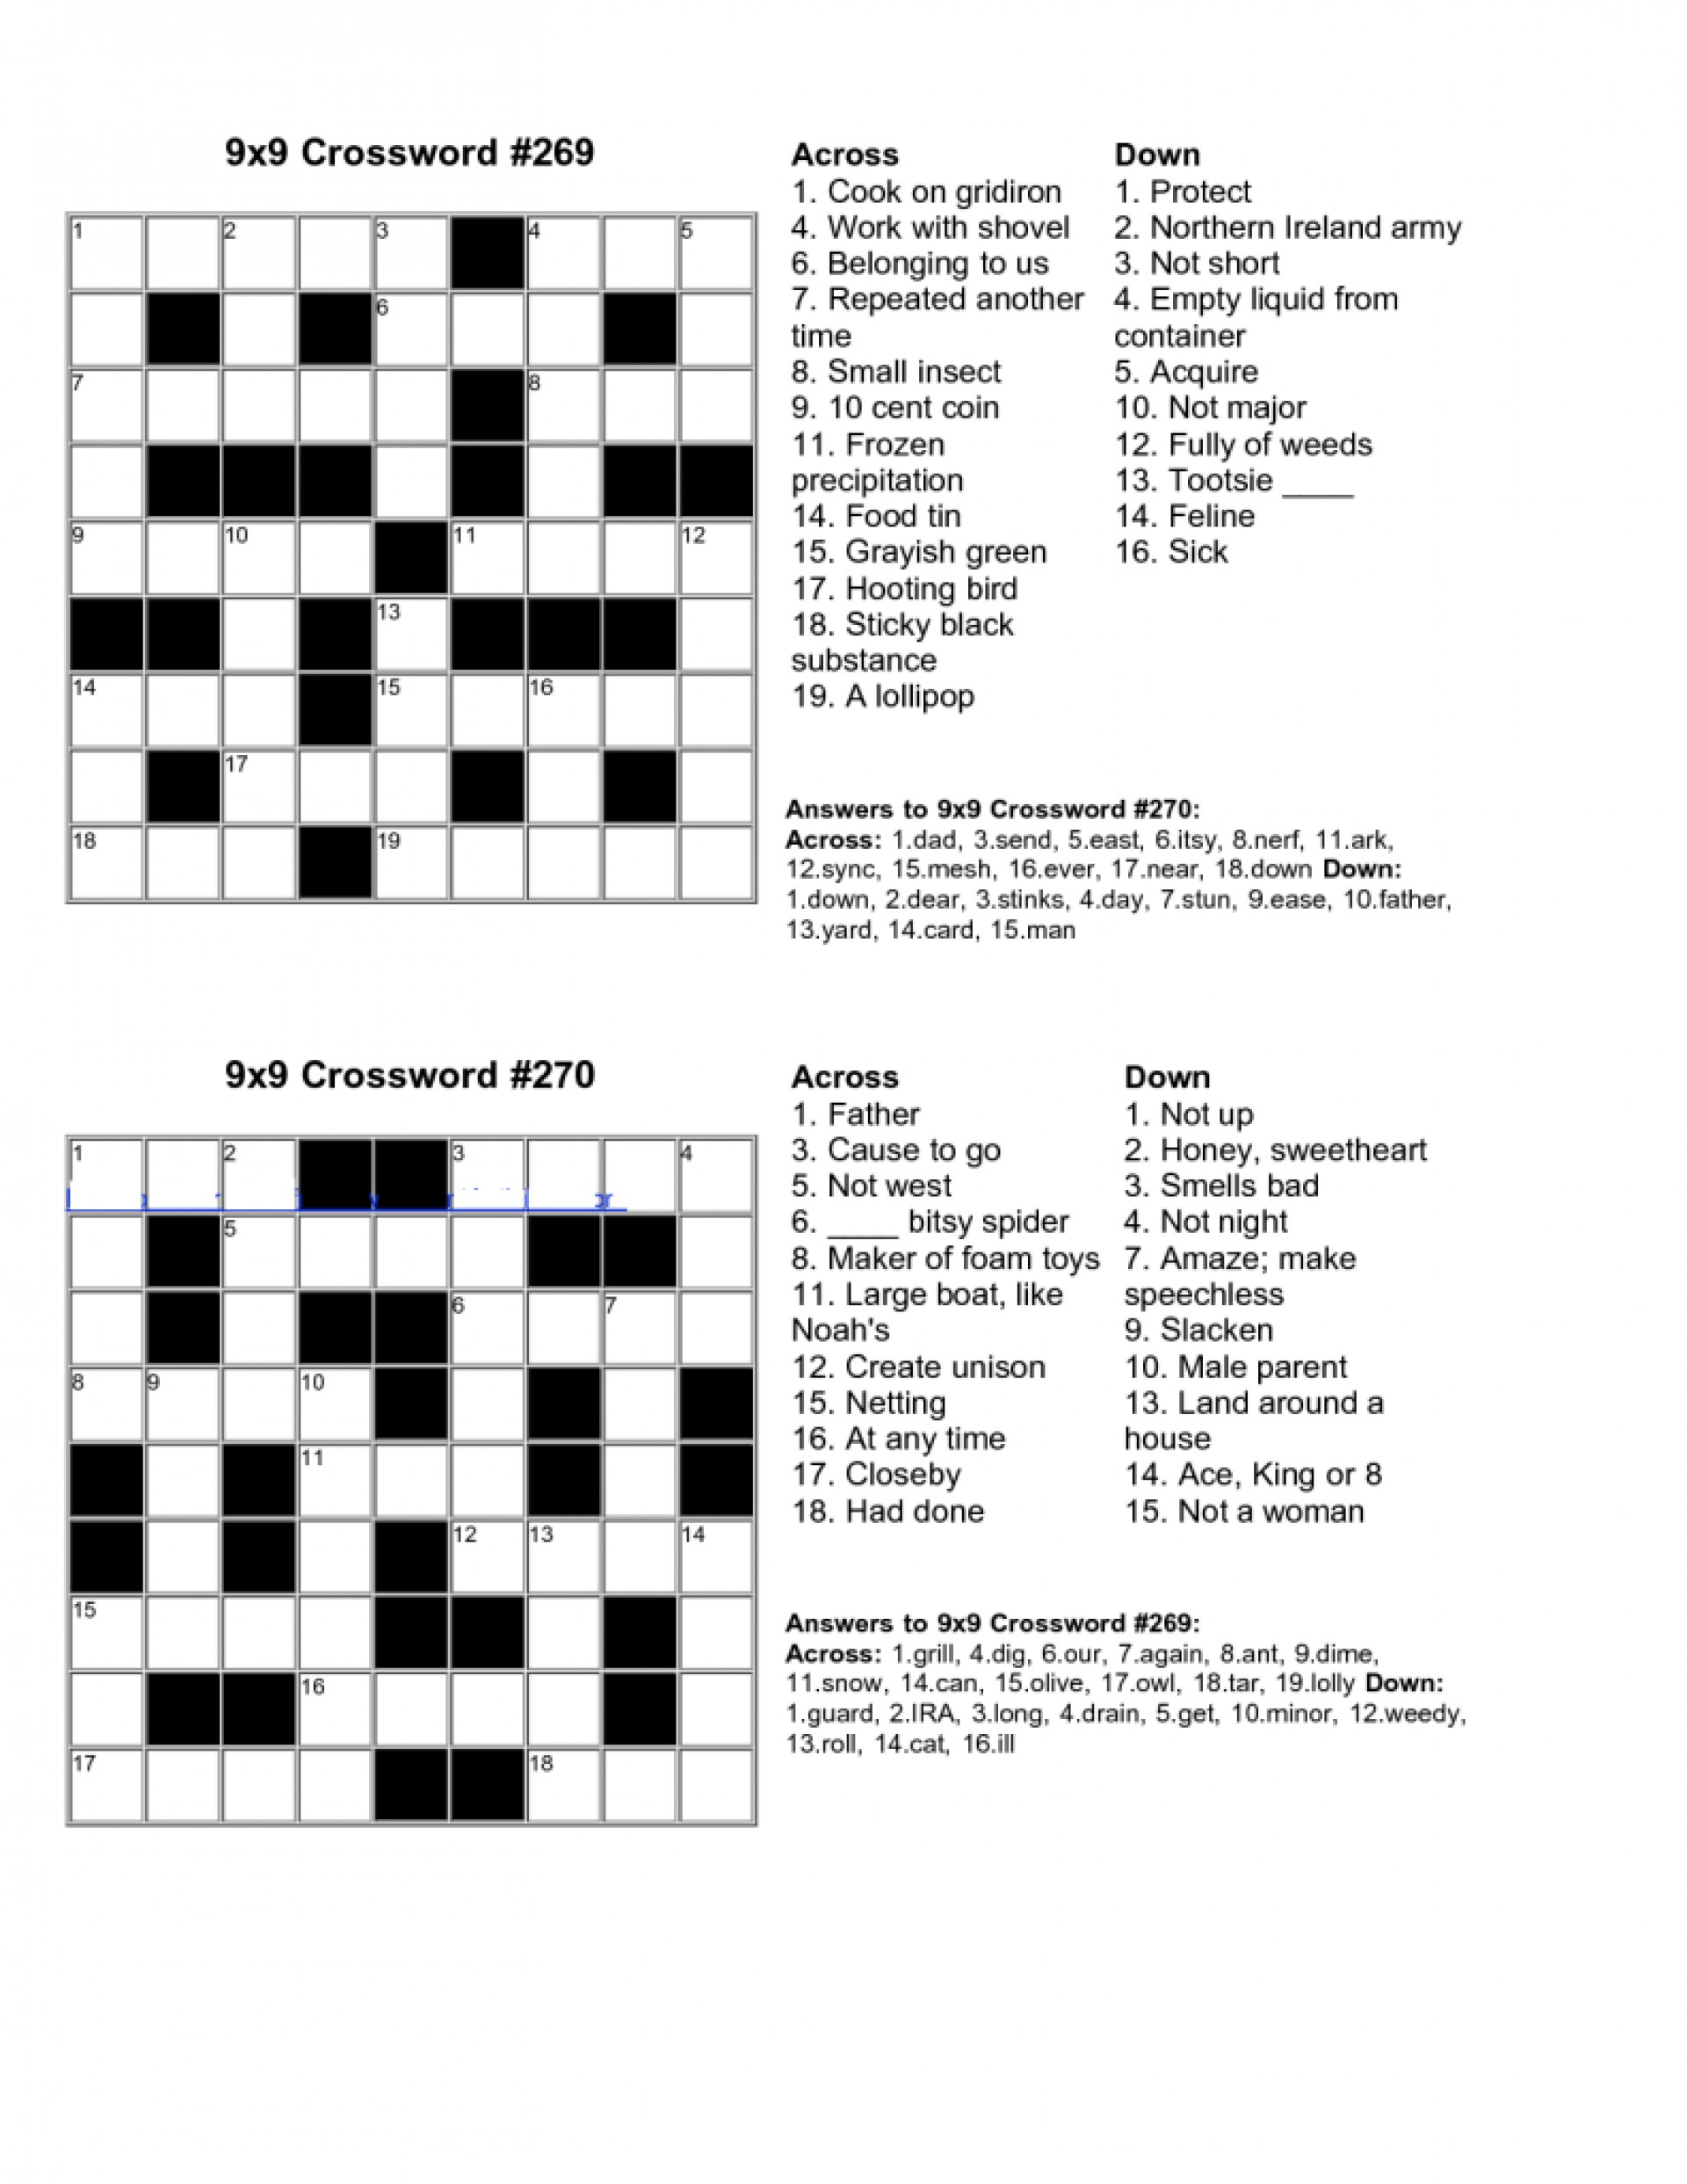 Free Crossword Puzzle Maker Printable - Stepindance.fr - Free Crossword Puzzle Maker Printable